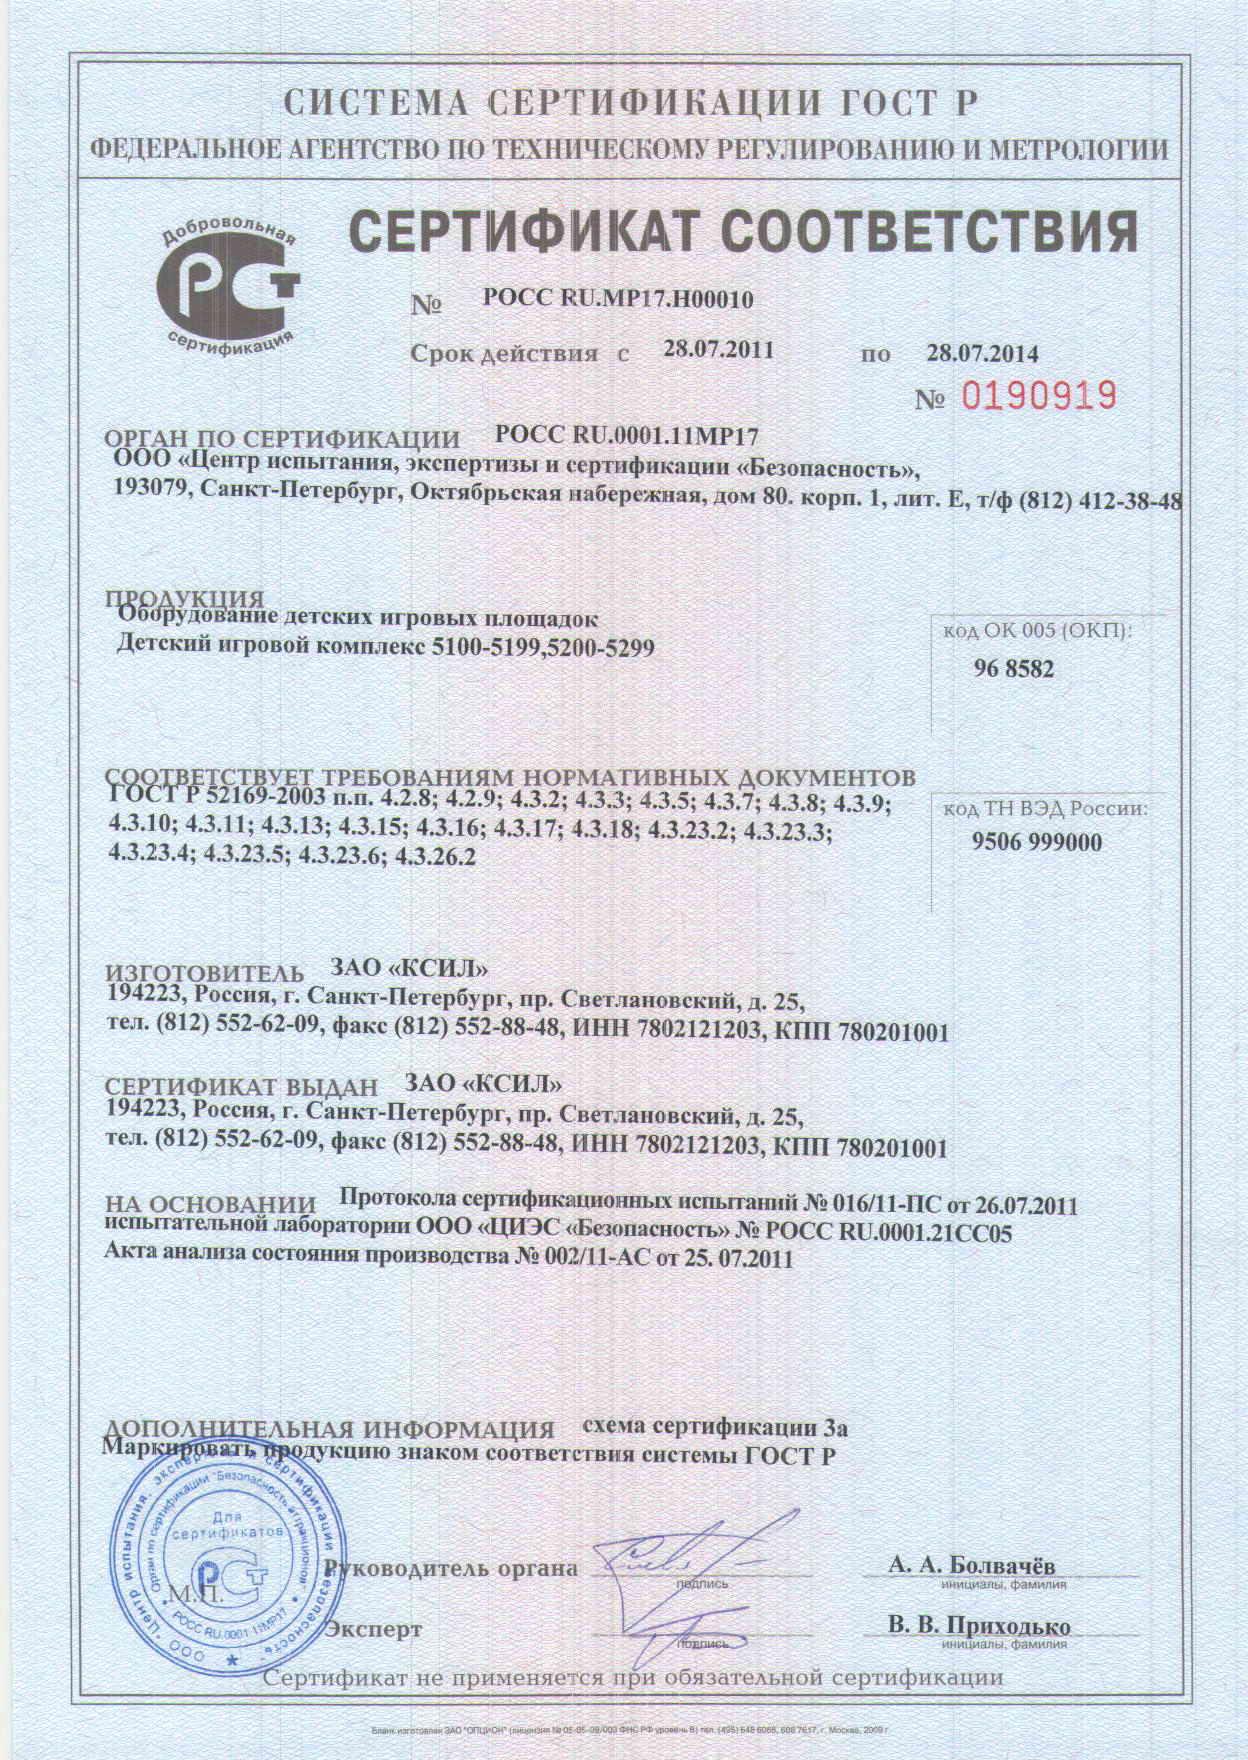 Сертификат 0190919 ДИК 5100-5299